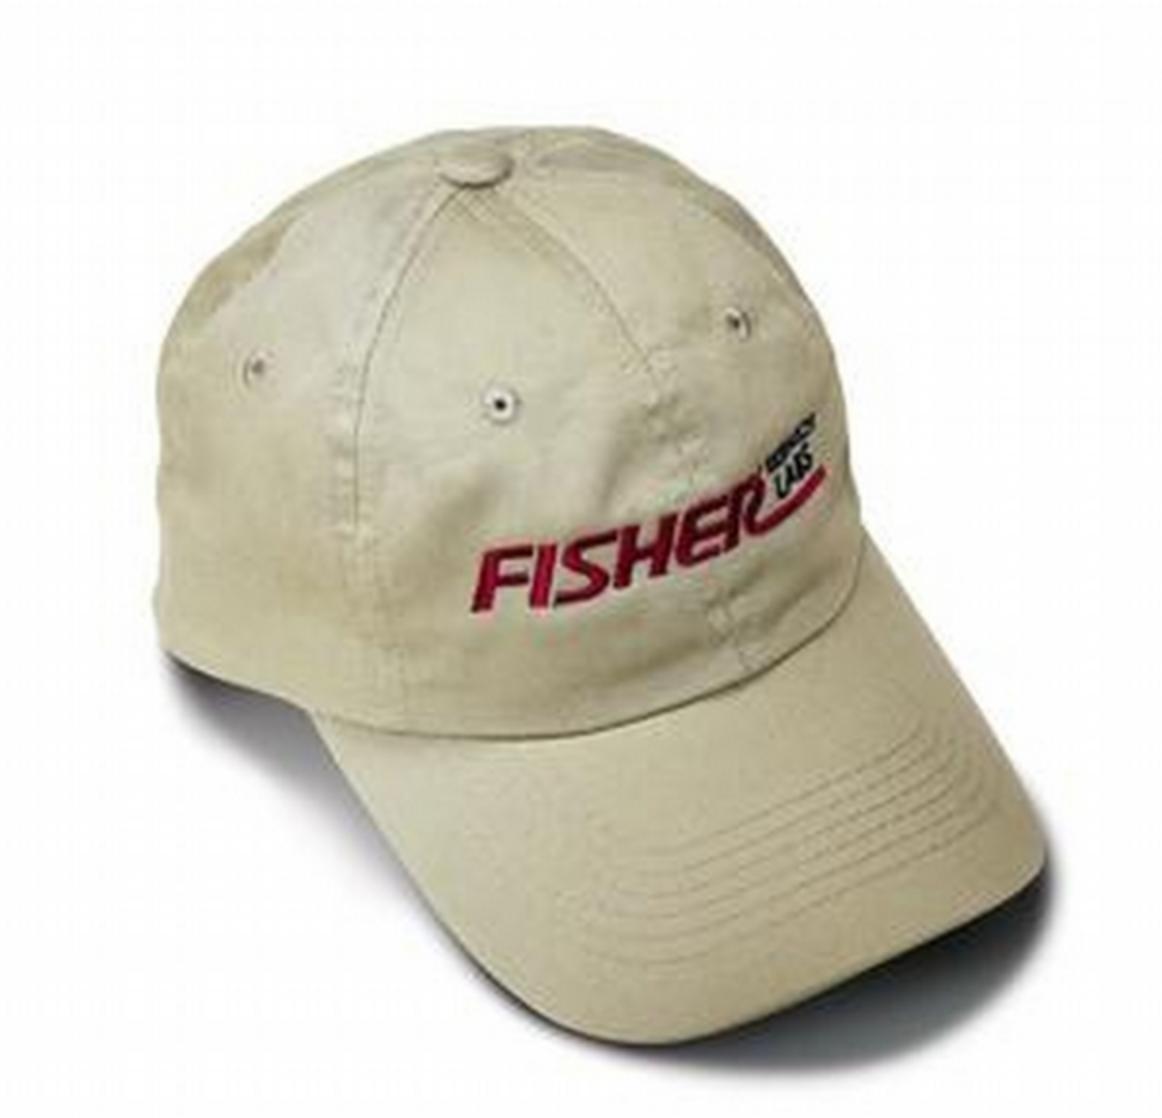 Fisher RED Logo Metal Detector Baseball Cap with Fastener Strap Closure